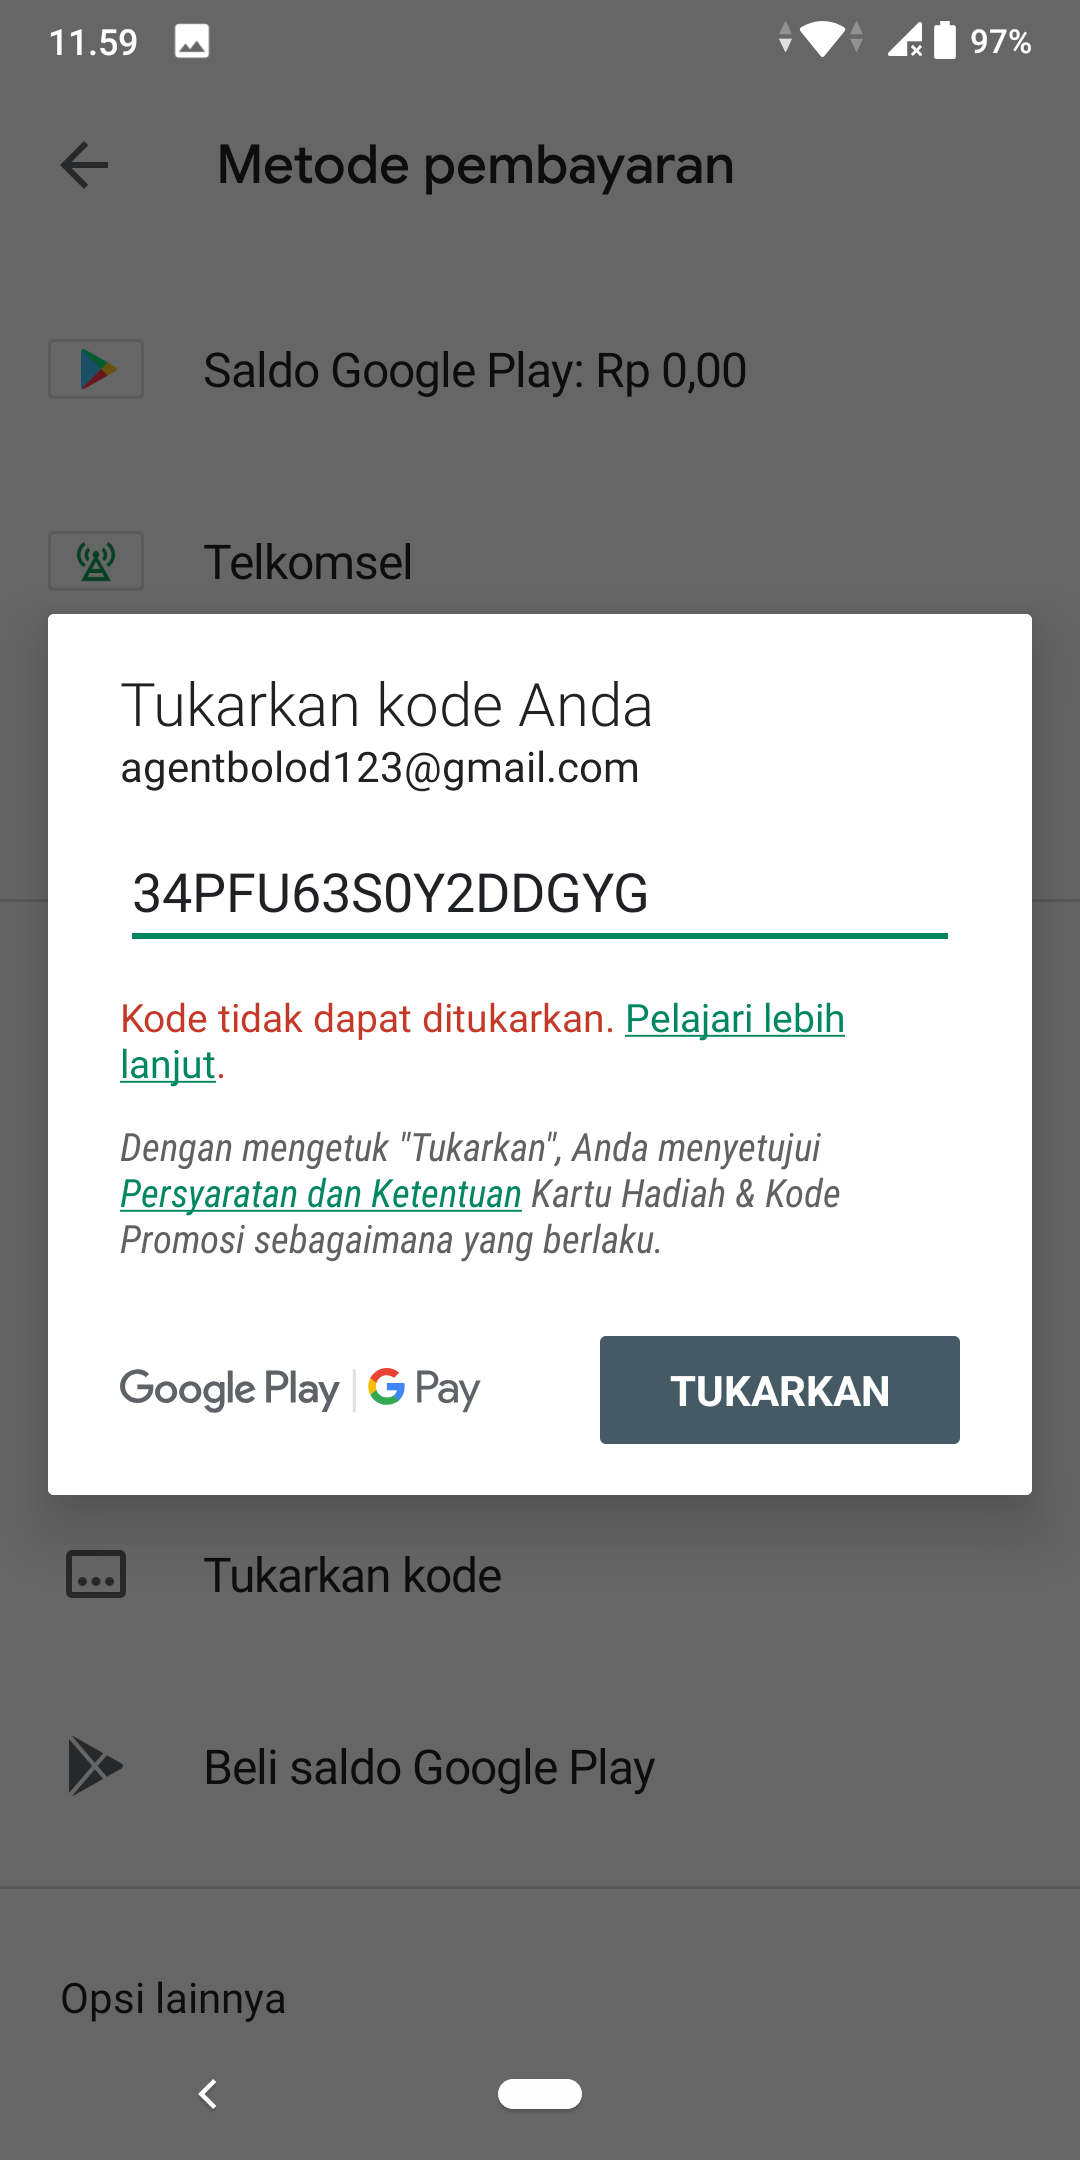 Kenapa Voucher Google Play Saya Tidak Dapat Di Tukarkan Padahal Di Alfamart Dinyatakan Sukses Kak Komunitas Google Play